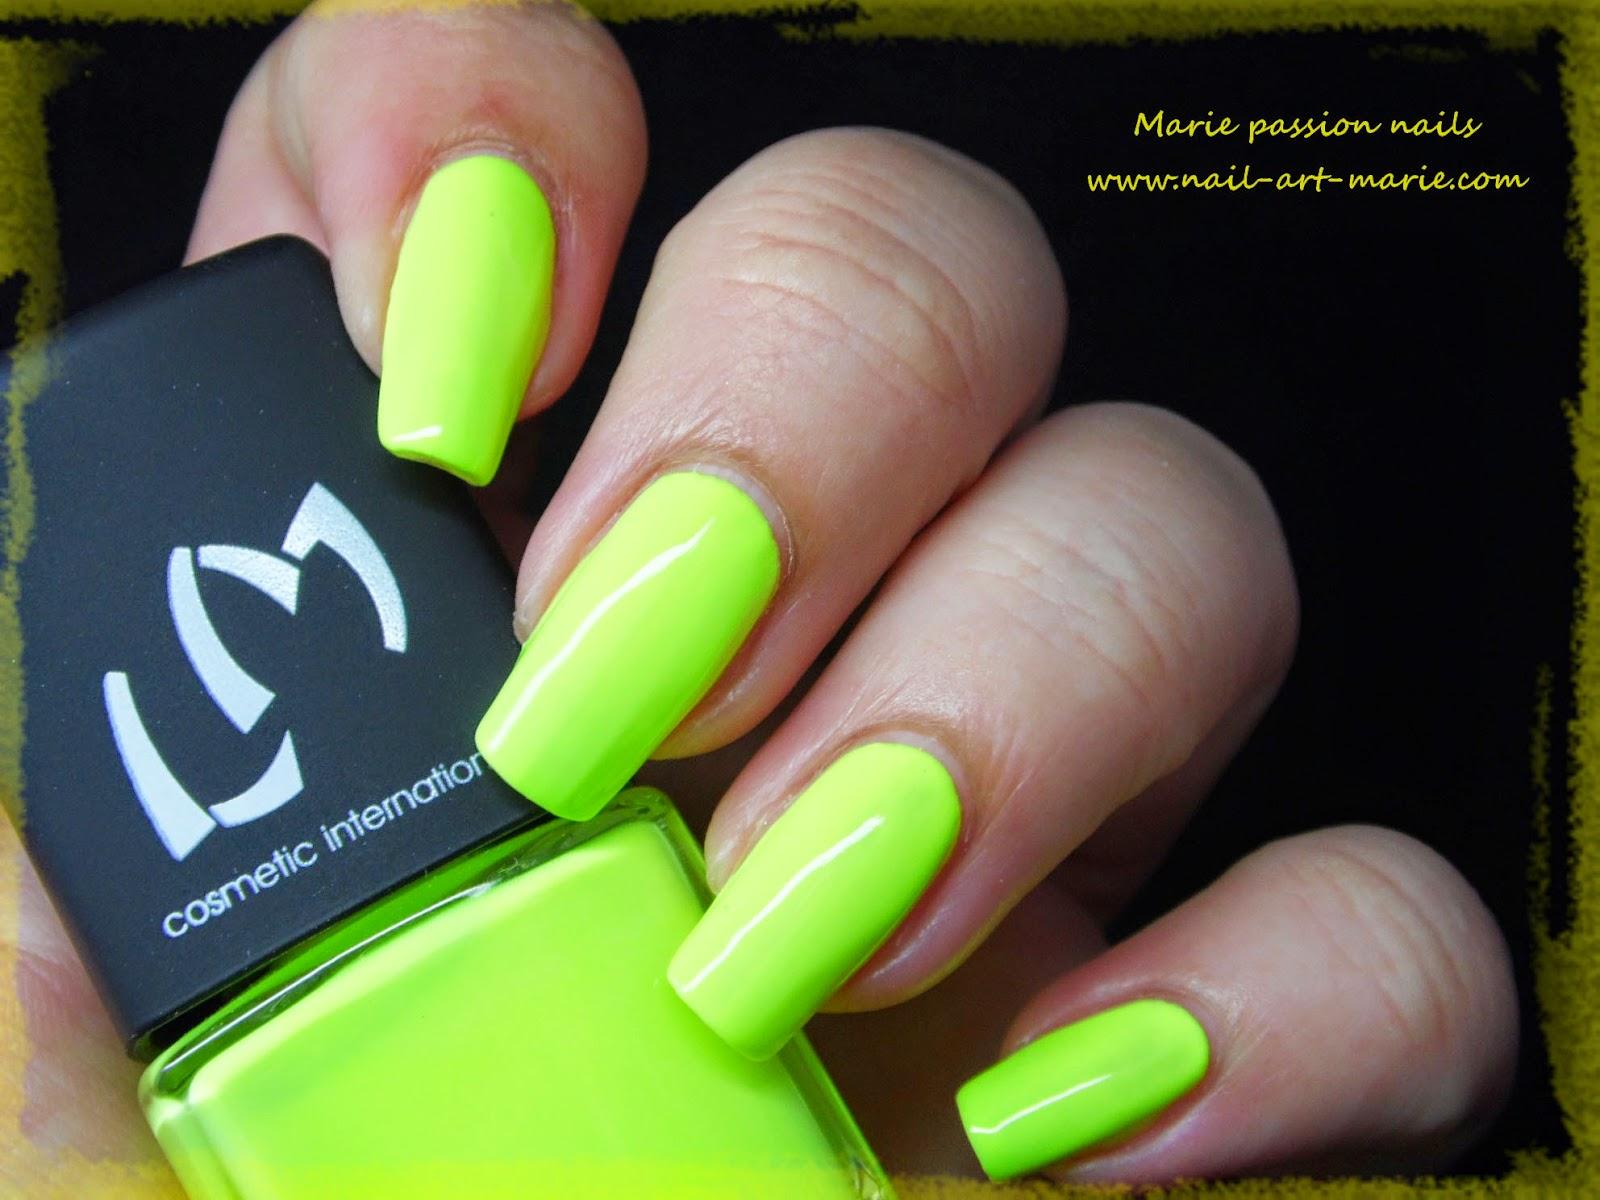 LM Cosmetic Yellow Submarine5